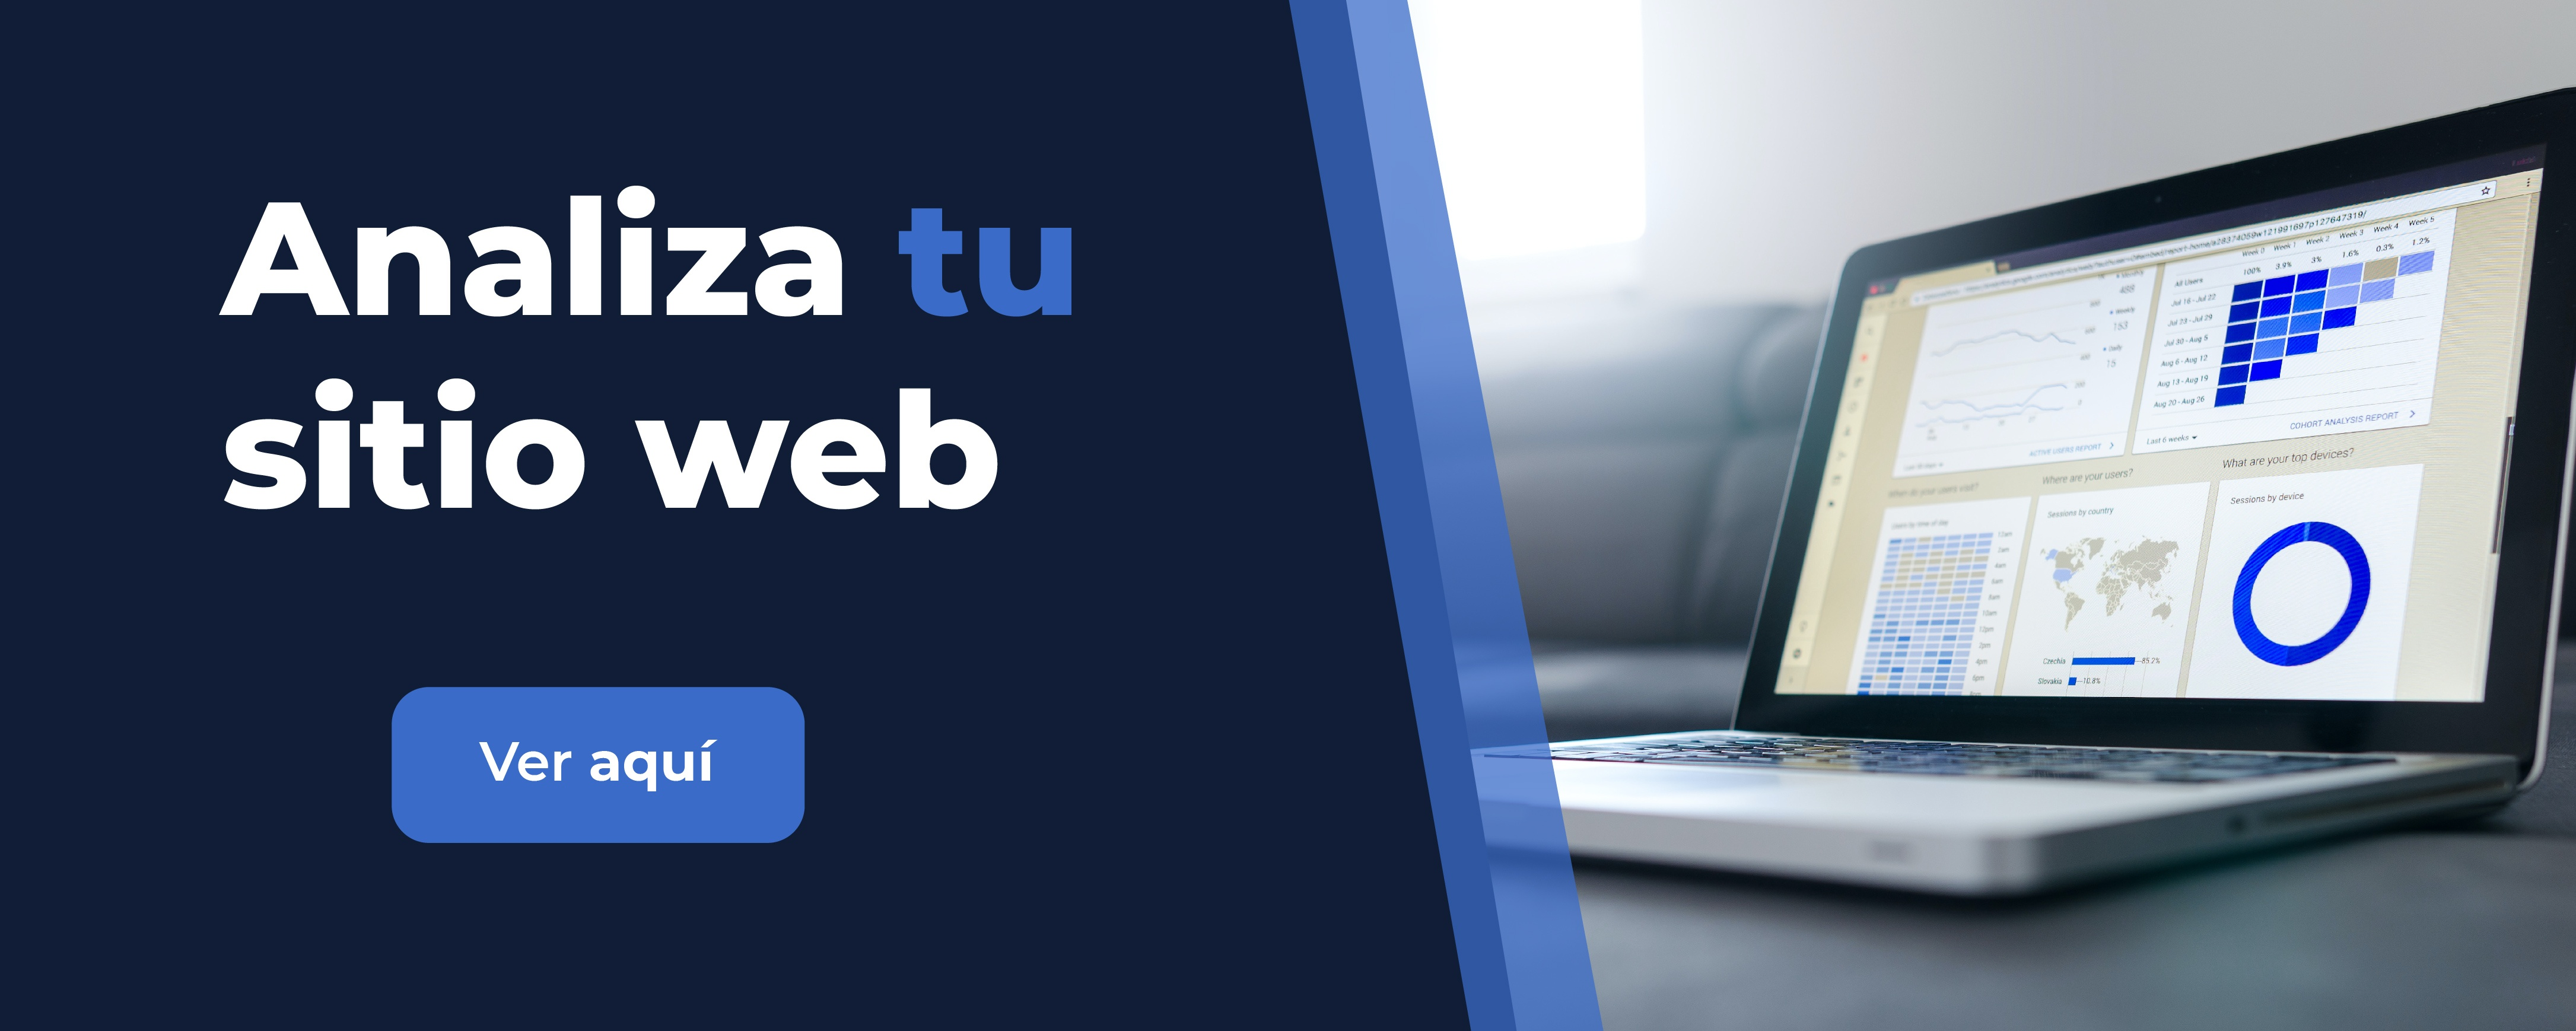 Analiza tu sitio web